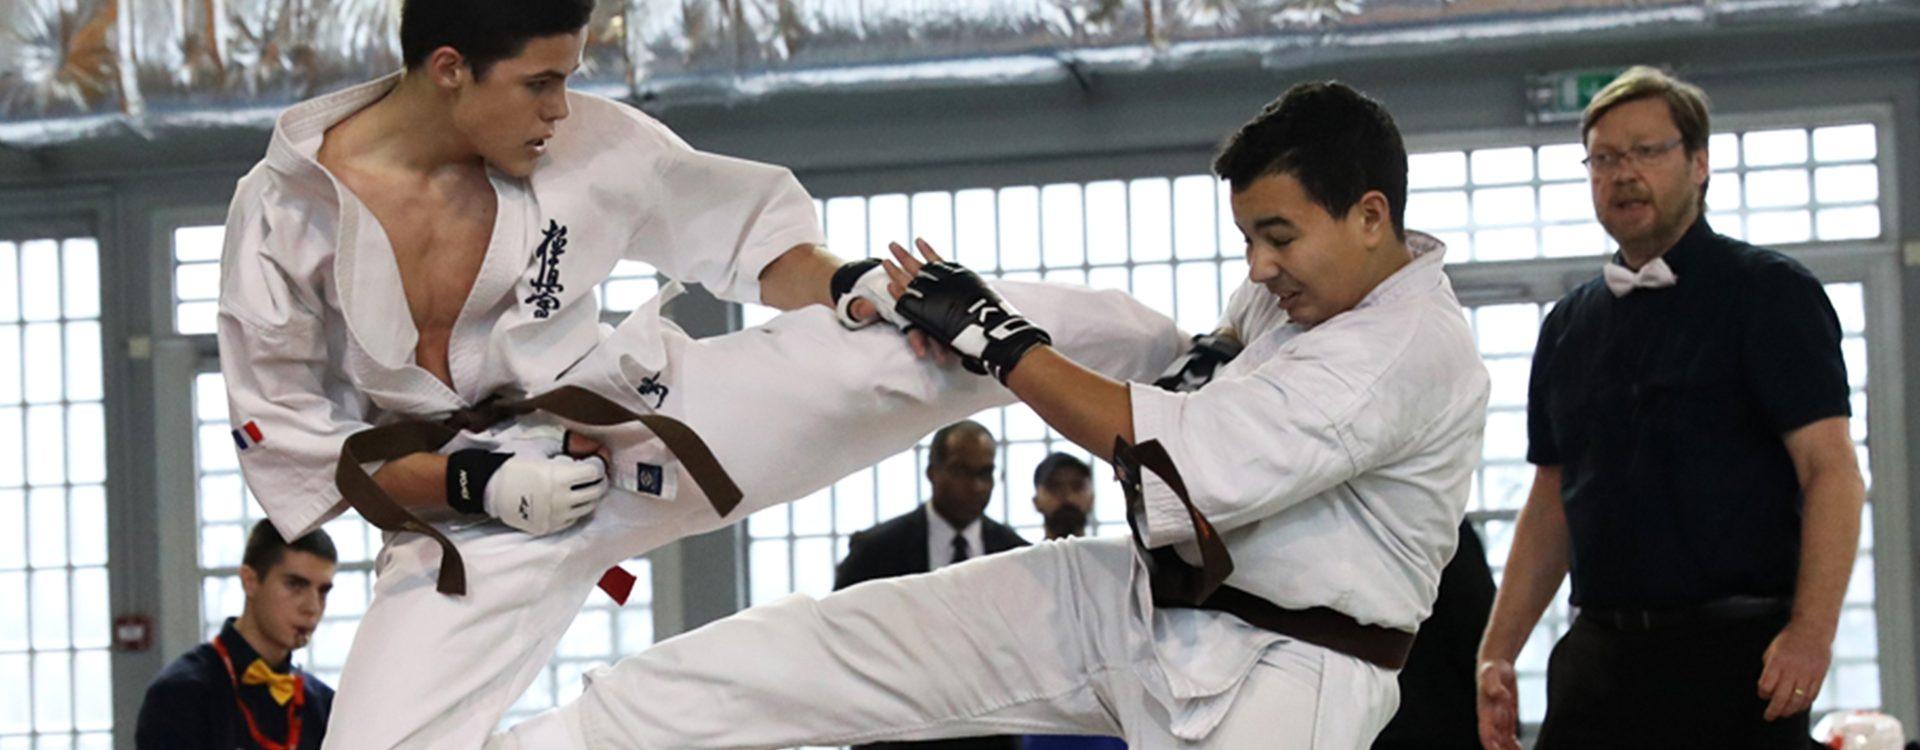 Visuel_COUVERTURE_kyokushinkai